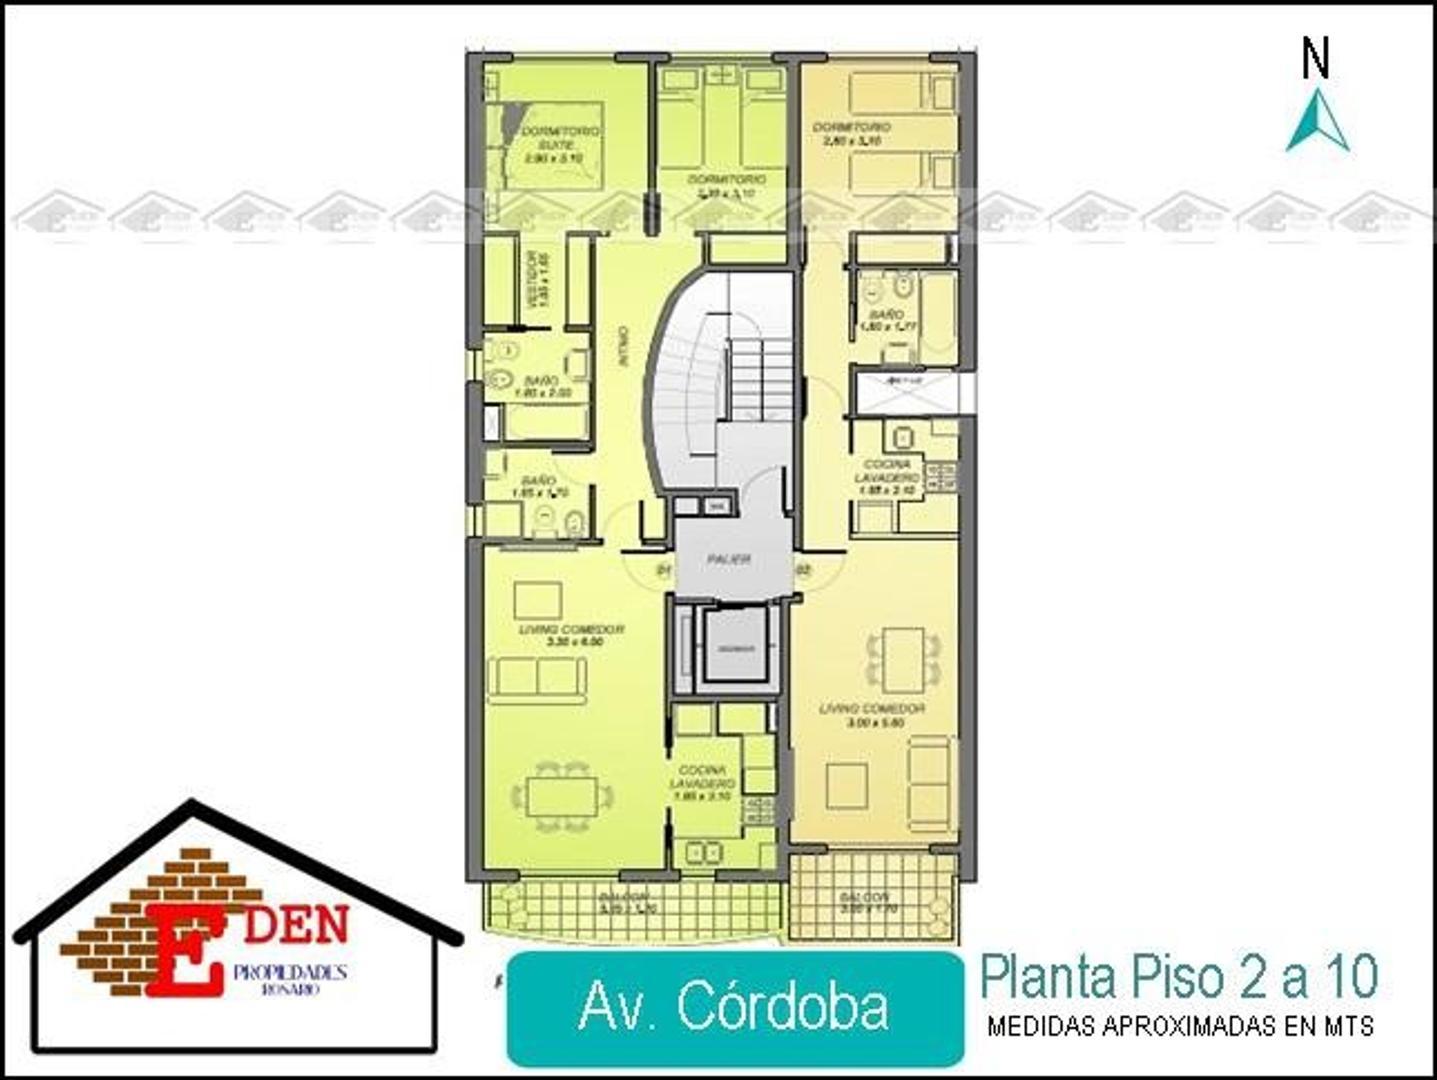 Departamento de 1 dormitorio con balcón en Av. Córdoba y Rodríguez   Entrega 2019